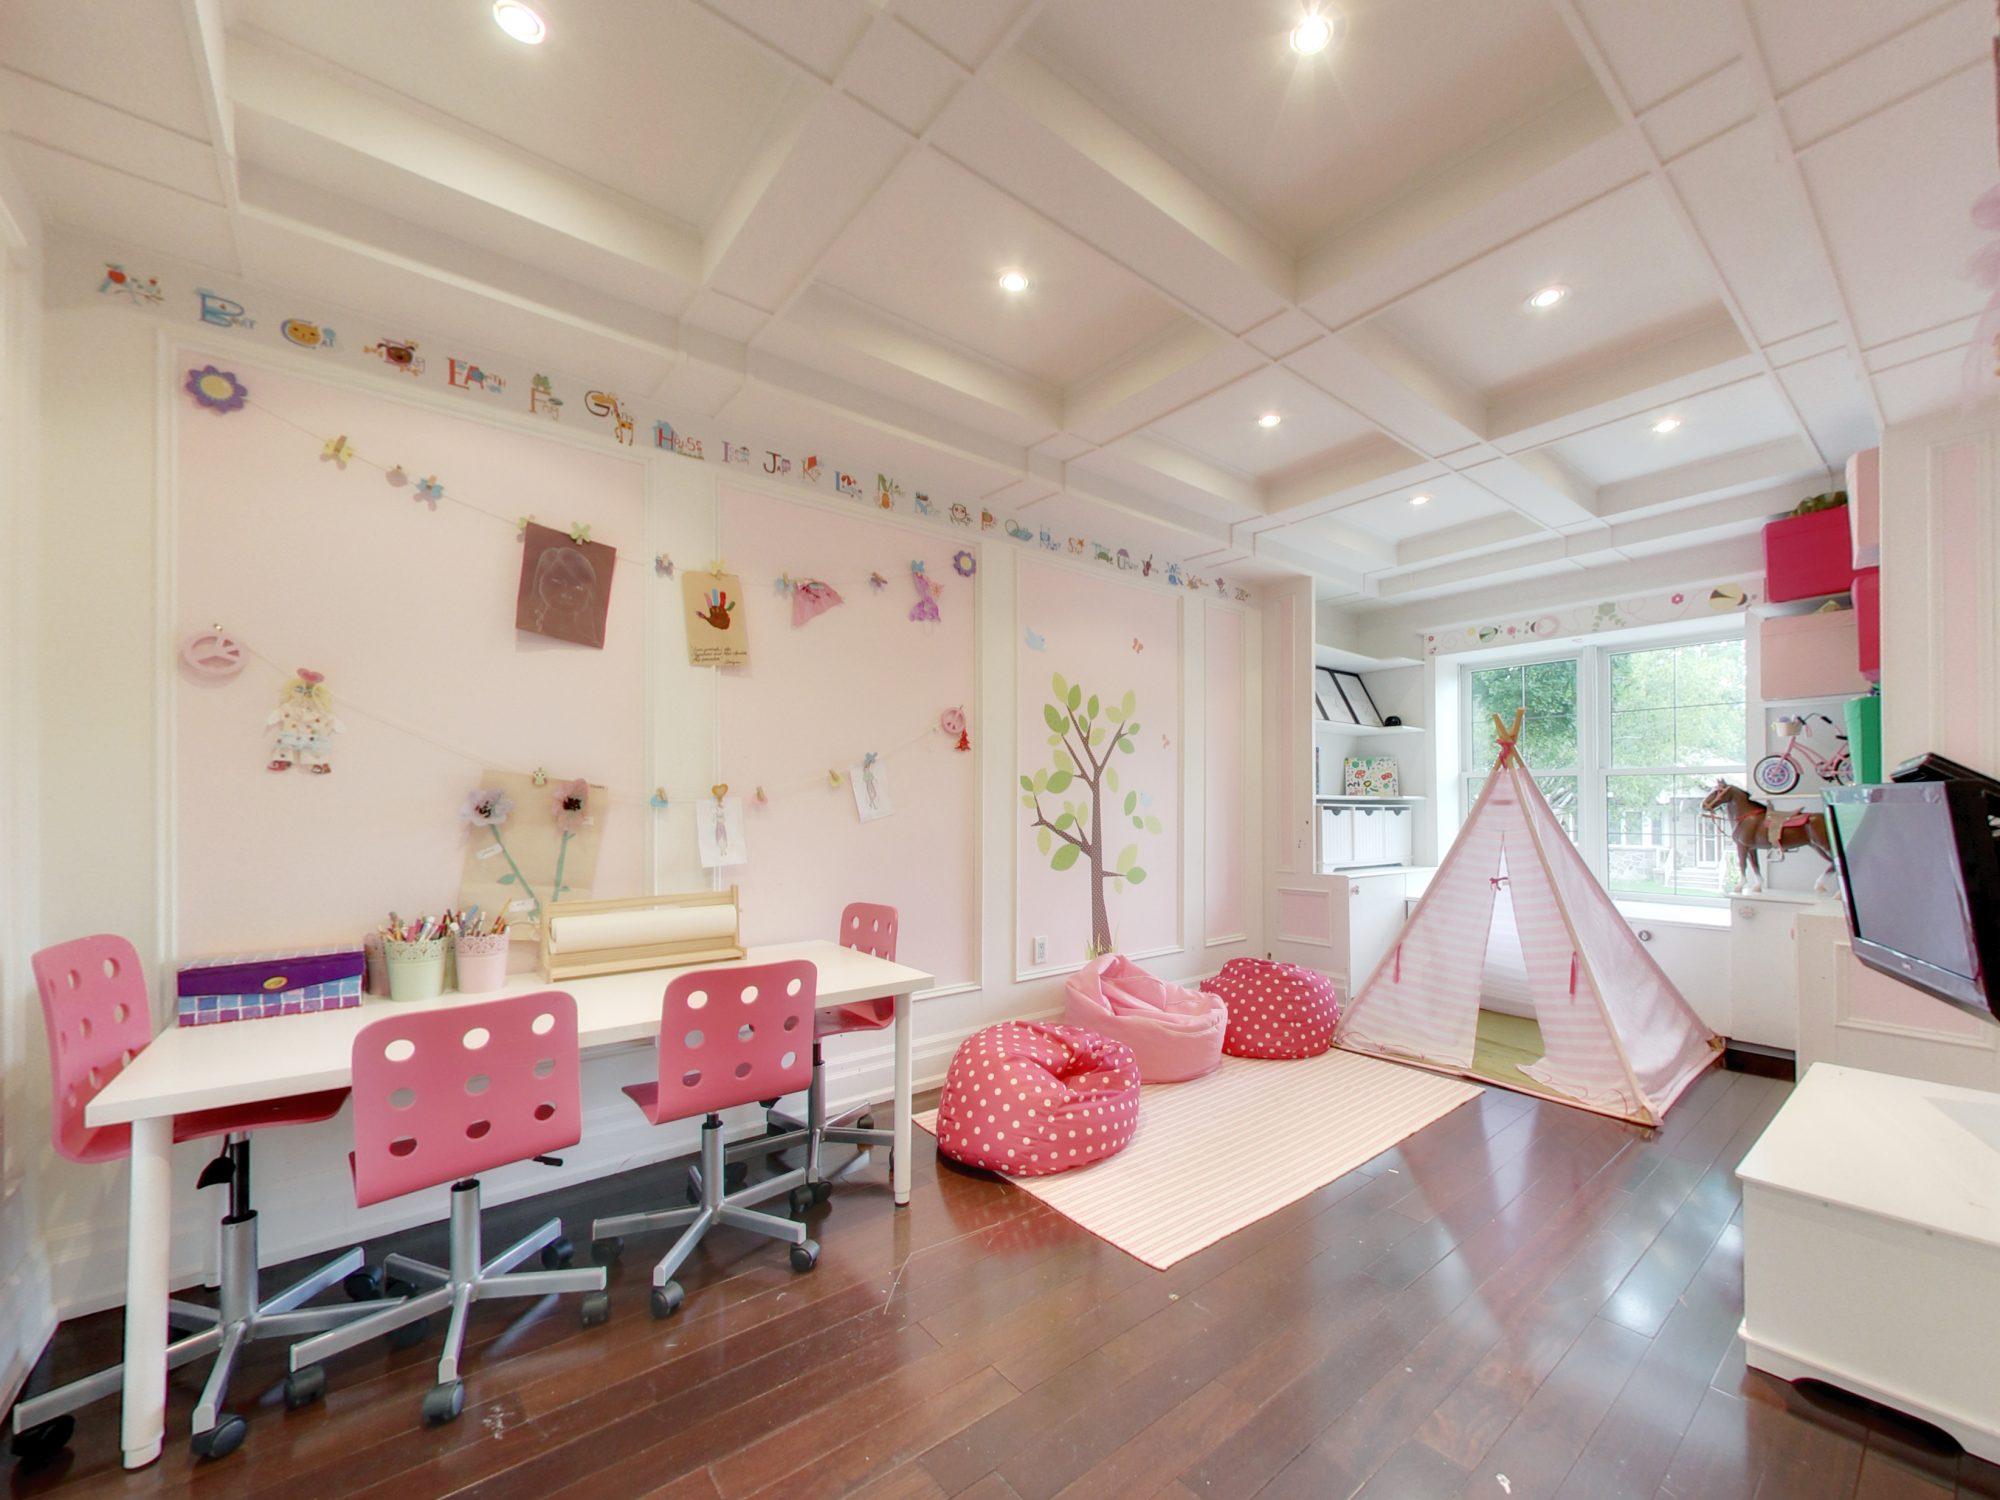 toronto-house-for-sale-15-shand-avenue-6